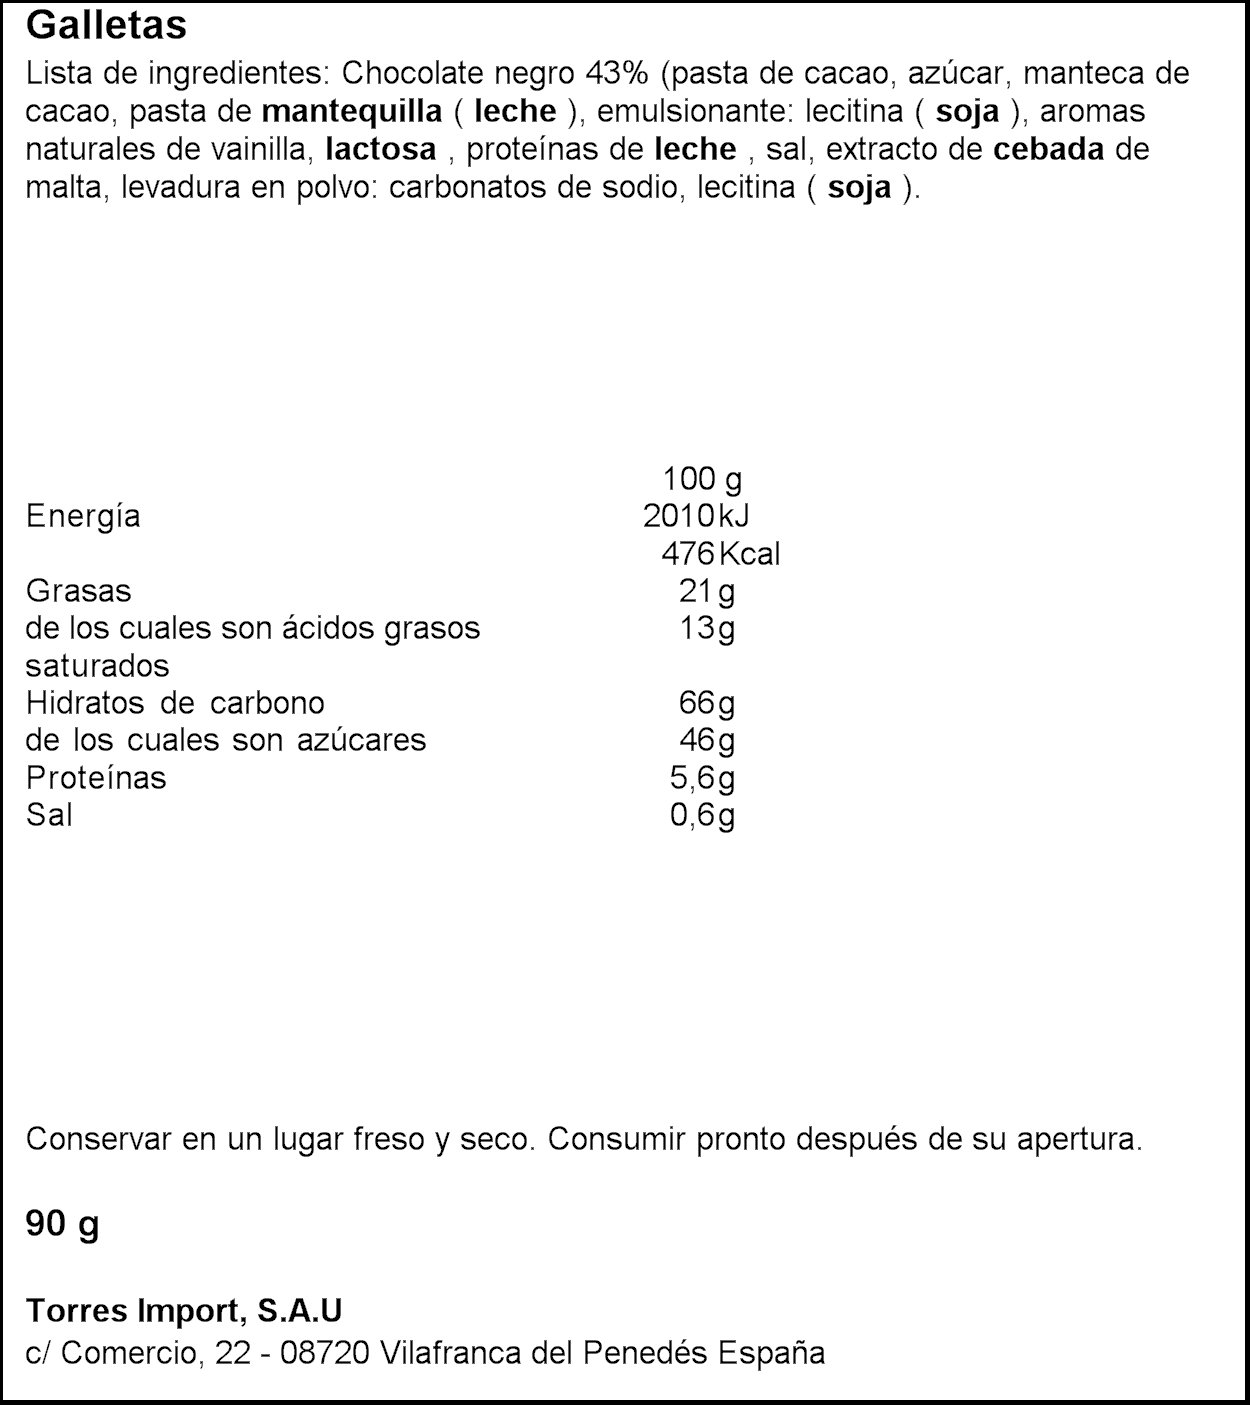 Gavottes Waffelröllchen in Zartbitterschokolade 90 g: Amazon.com: Grocery & Gourmet Food